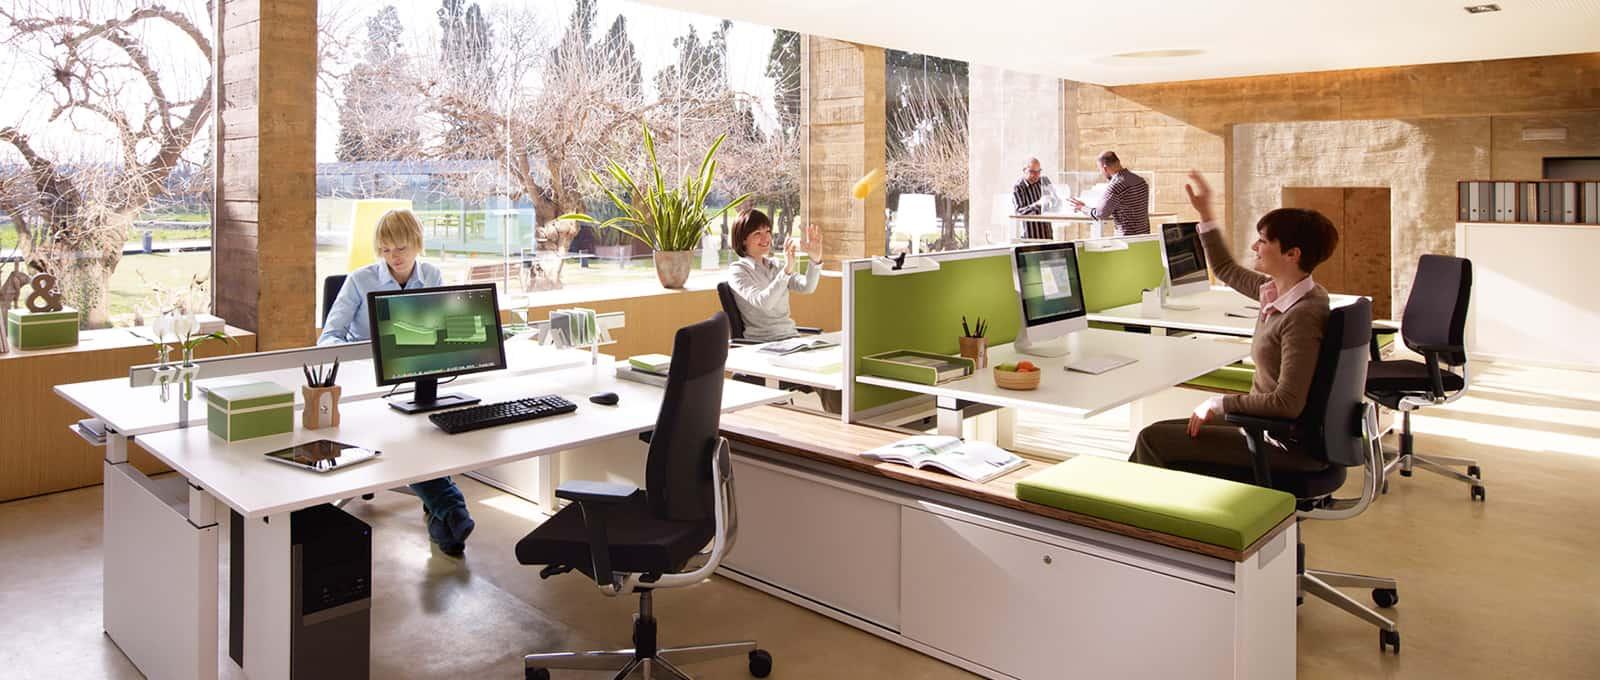 hagele-kantoormeubilair